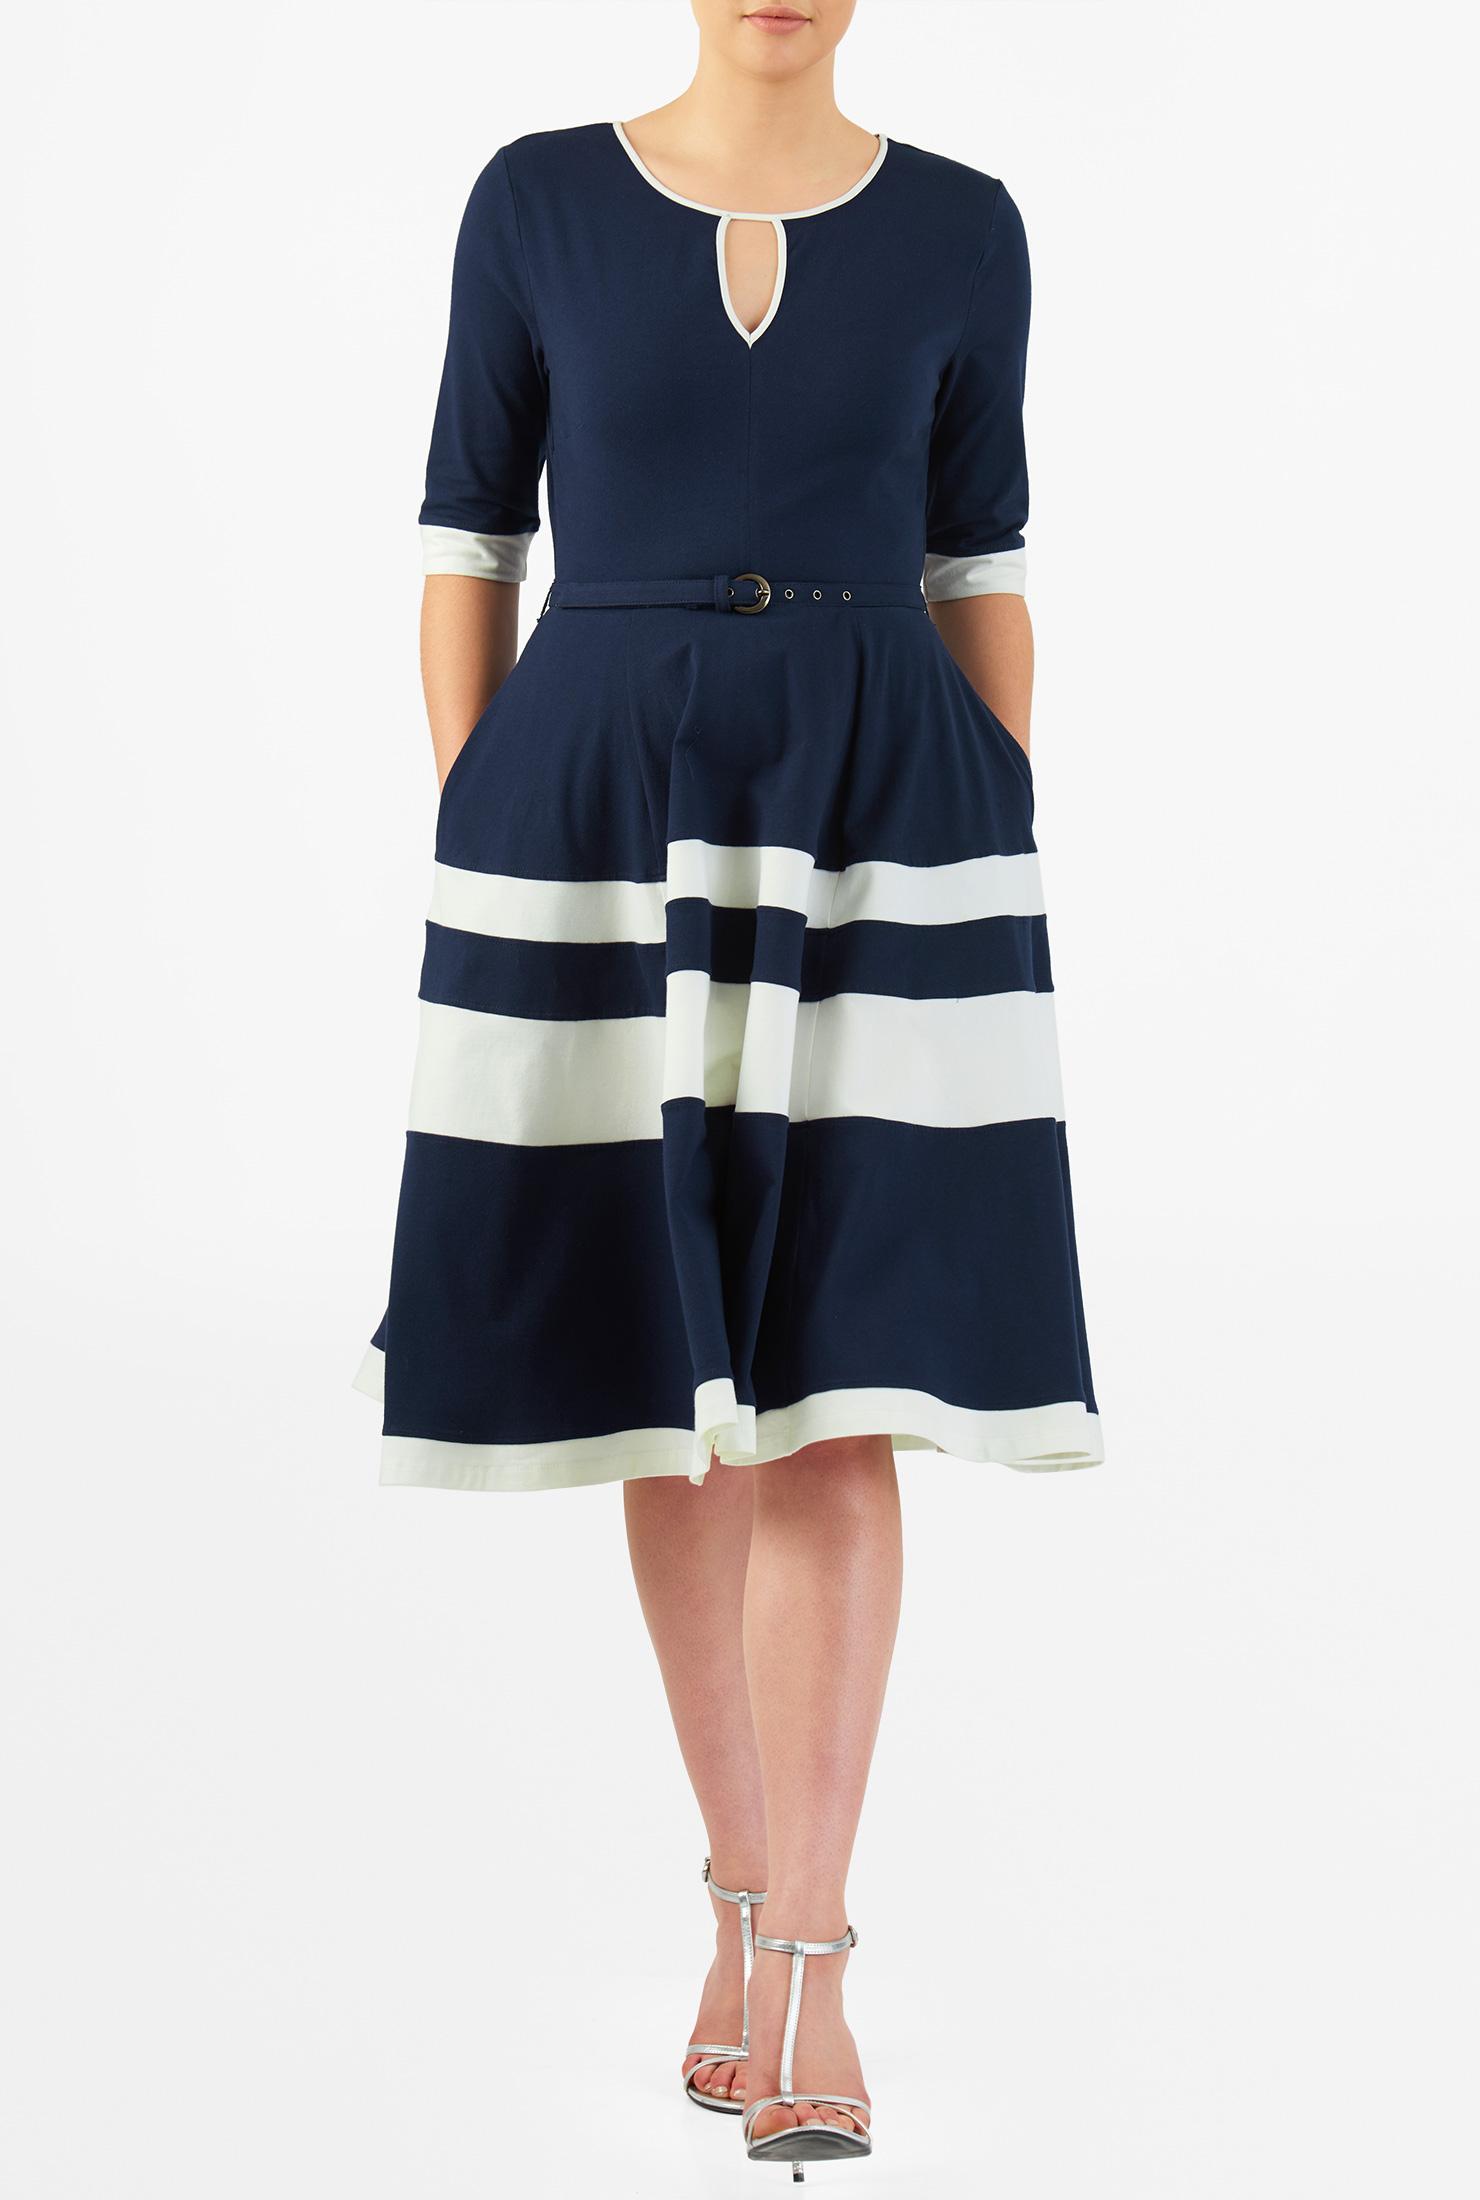 Eshakti Womens Contrast Banded Stripe Cotton Knit Belted Dress